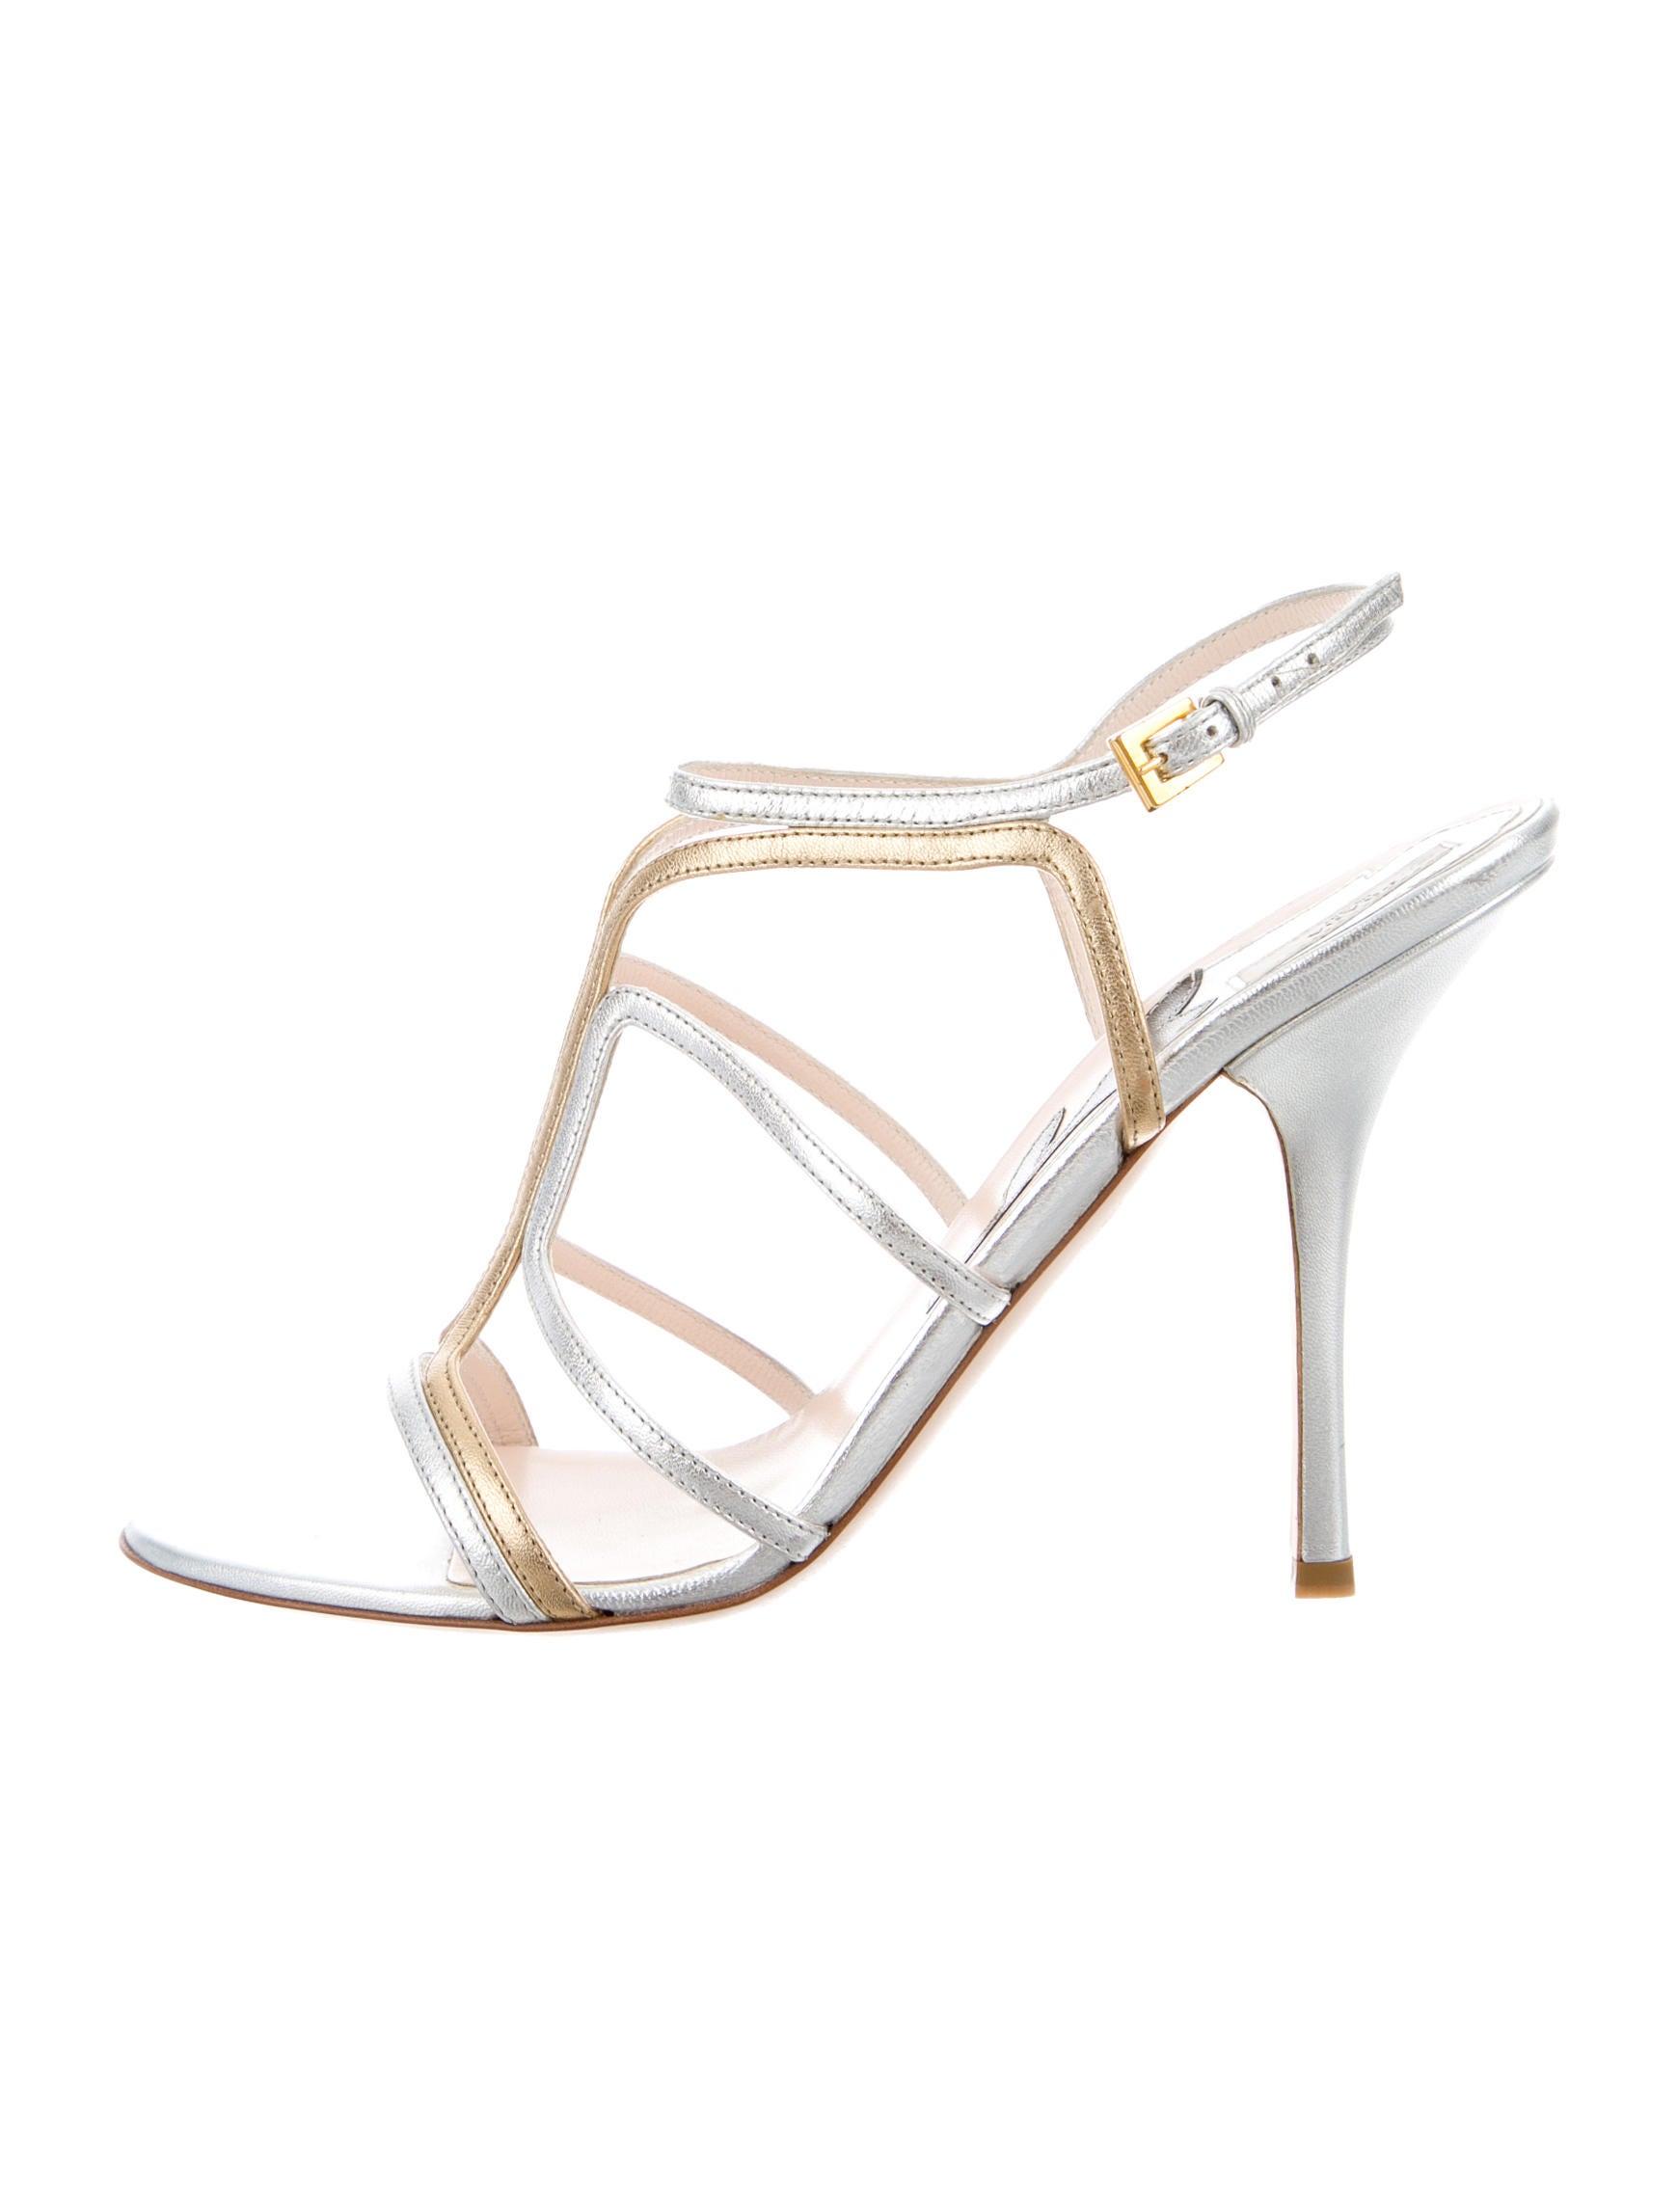 1437999b5 Prada Metallic Cage Sandals - Shoes - PRA84696